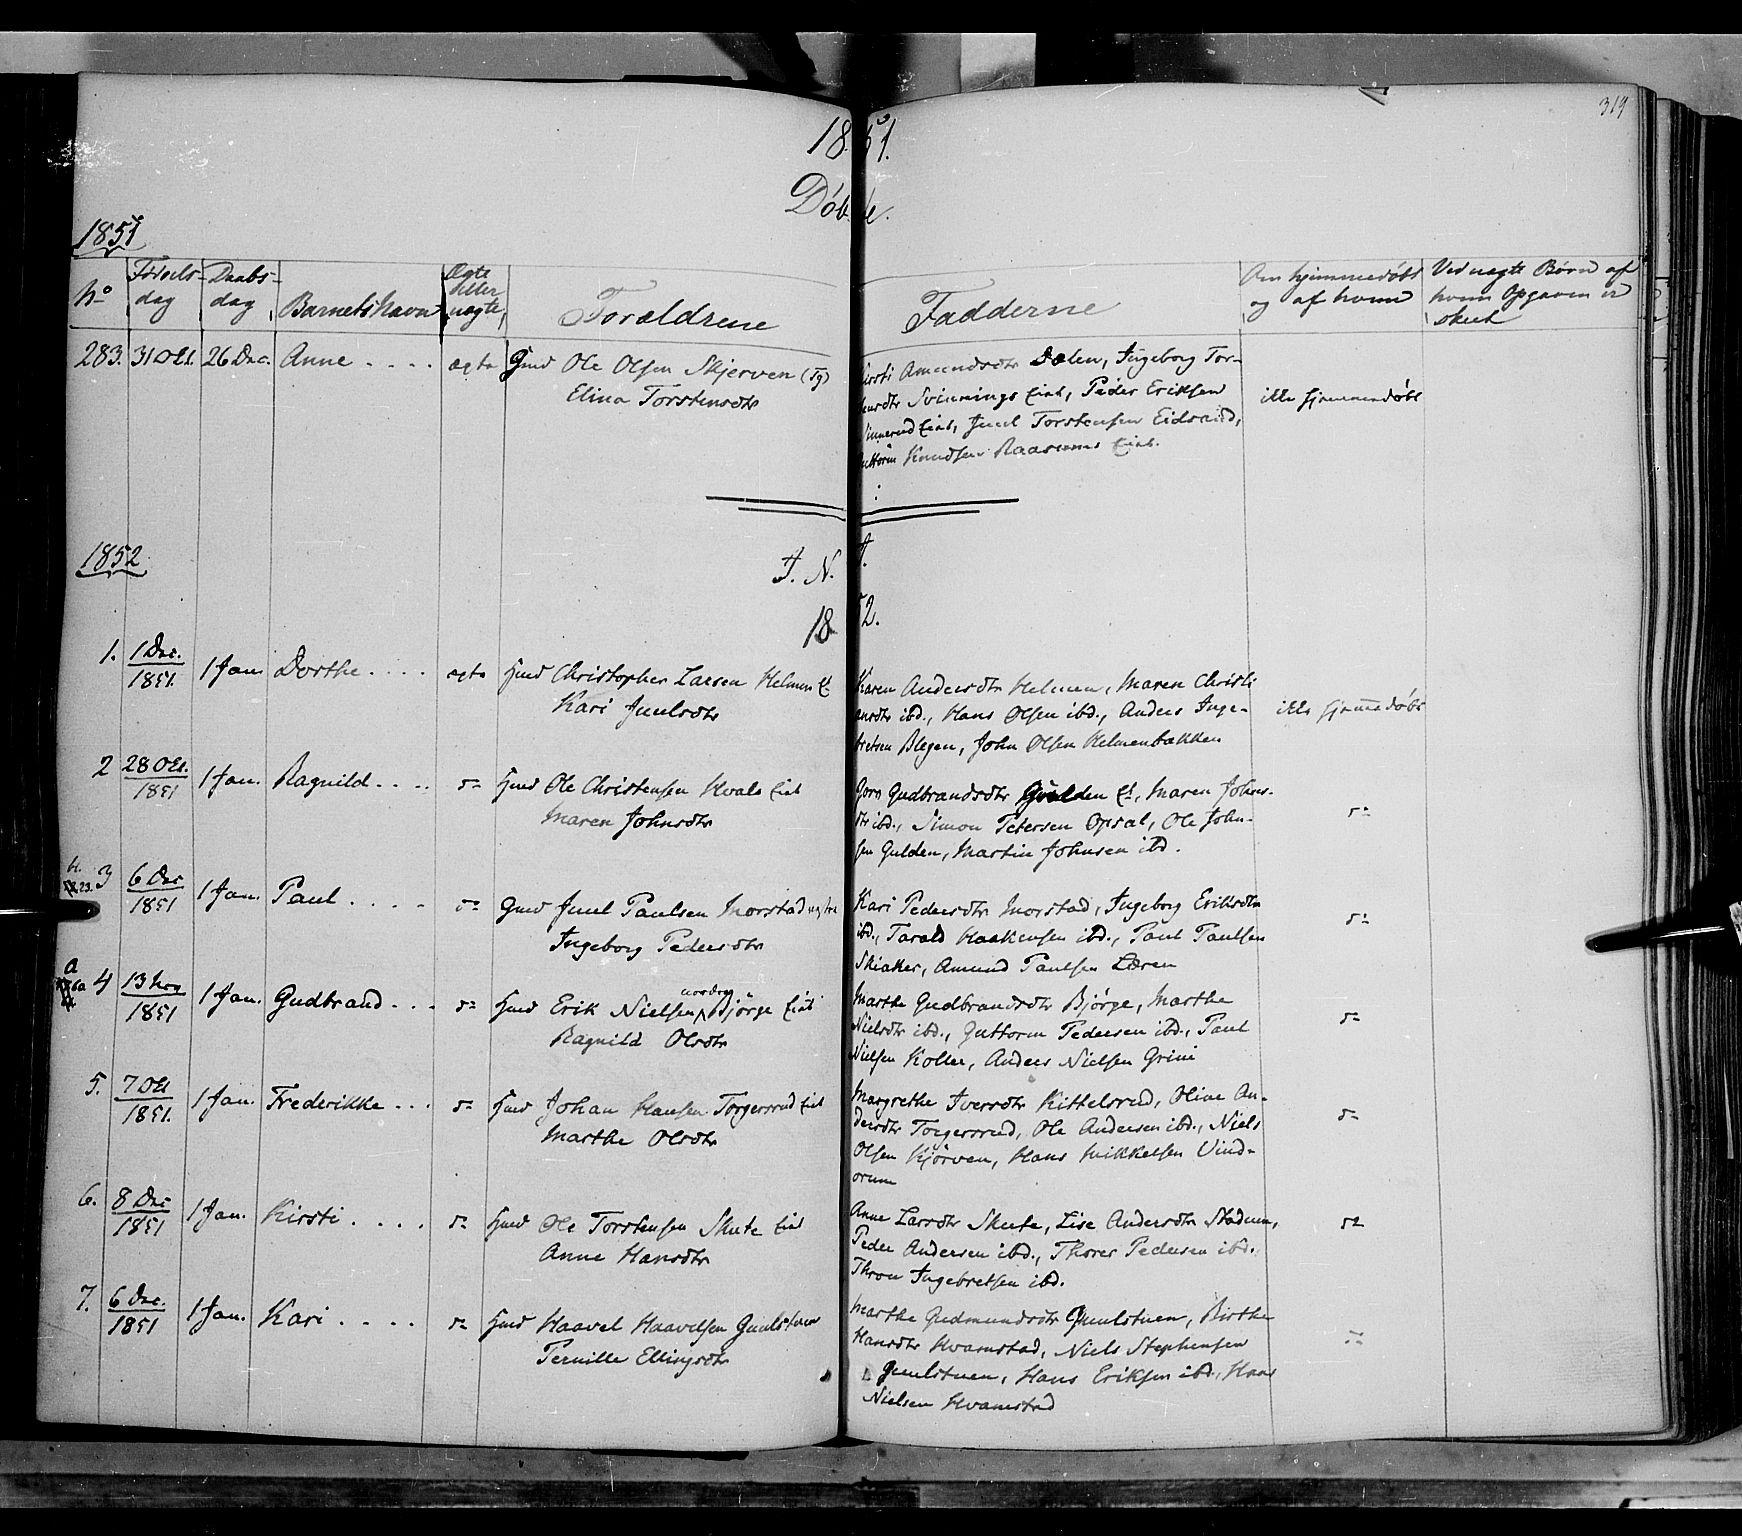 SAH, Gran prestekontor, Ministerialbok nr. 11, 1842-1856, s. 318-319